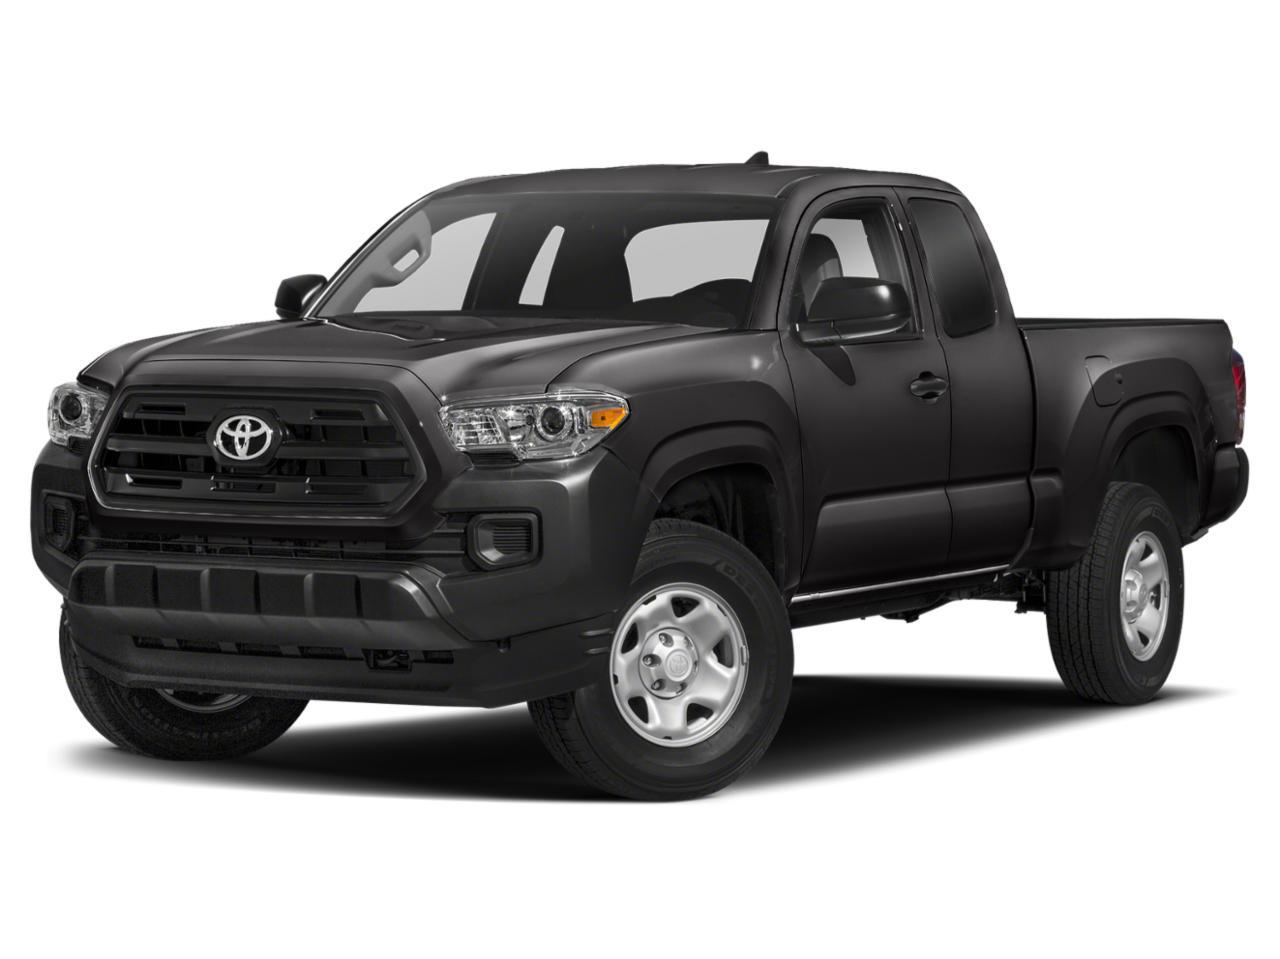 2018 Toyota Tacoma Vehicle Photo in Tulsa, OK 74133